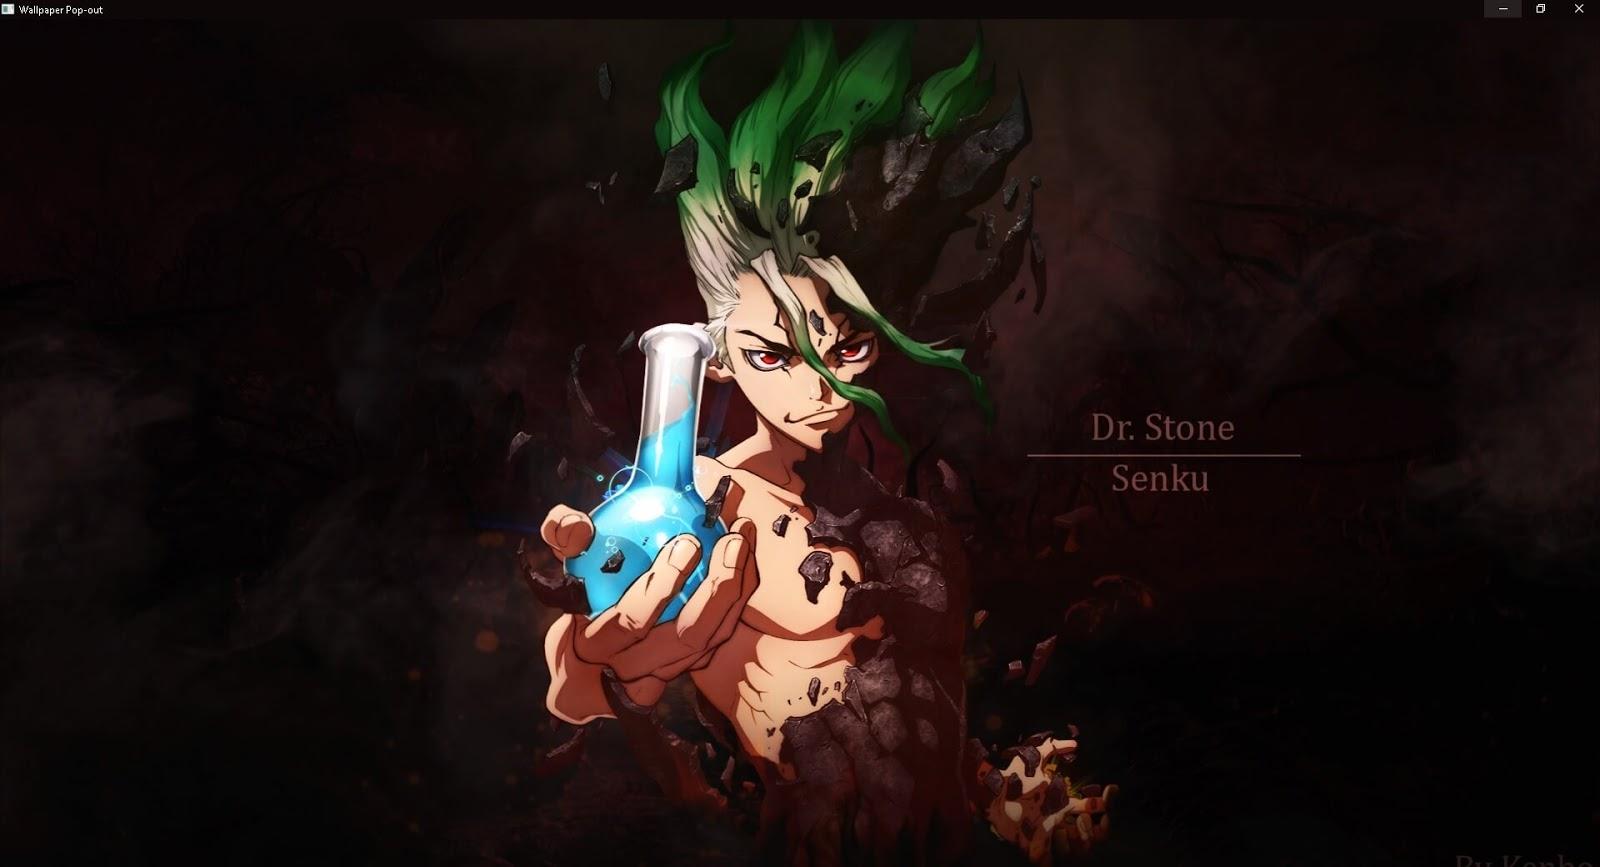 Dr Stone - Senku [Wallpaper Engine Anime]